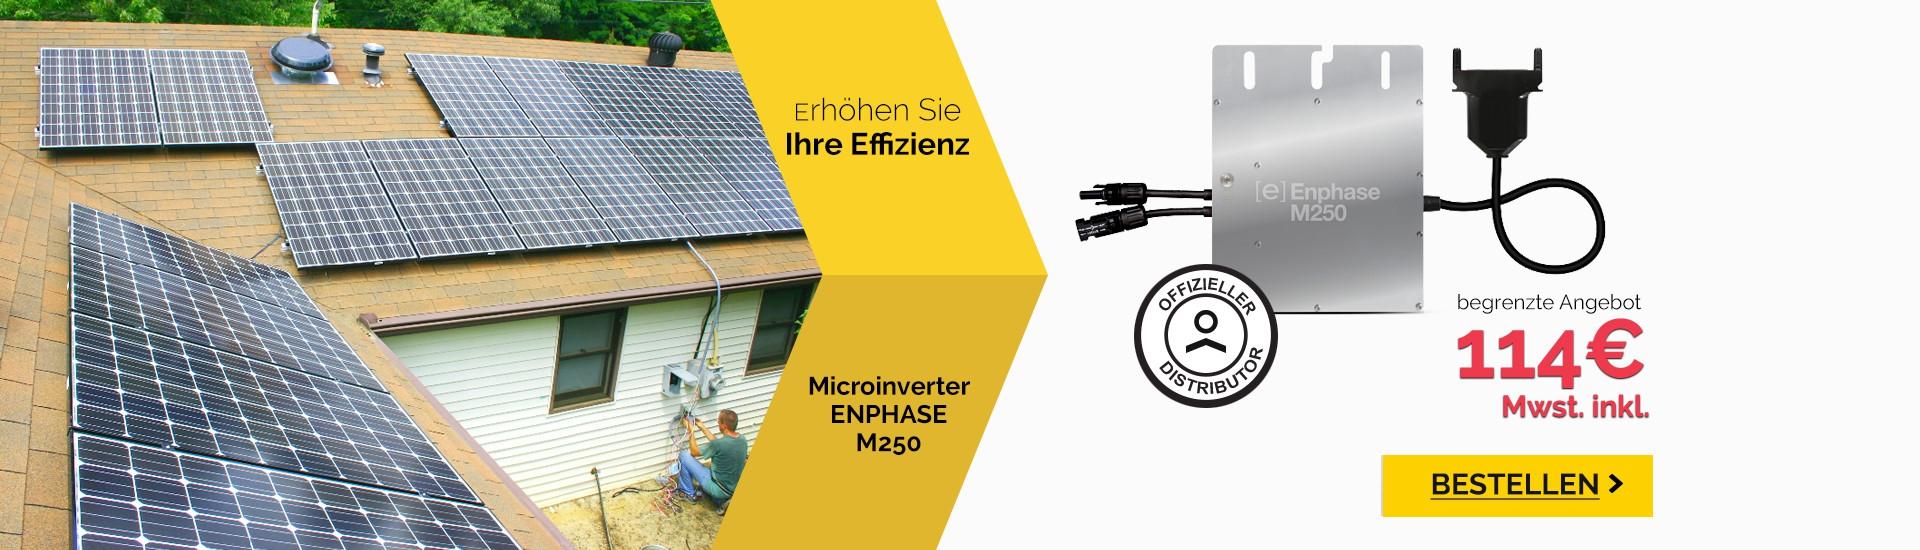 Enphase Micro-Wechselrichter